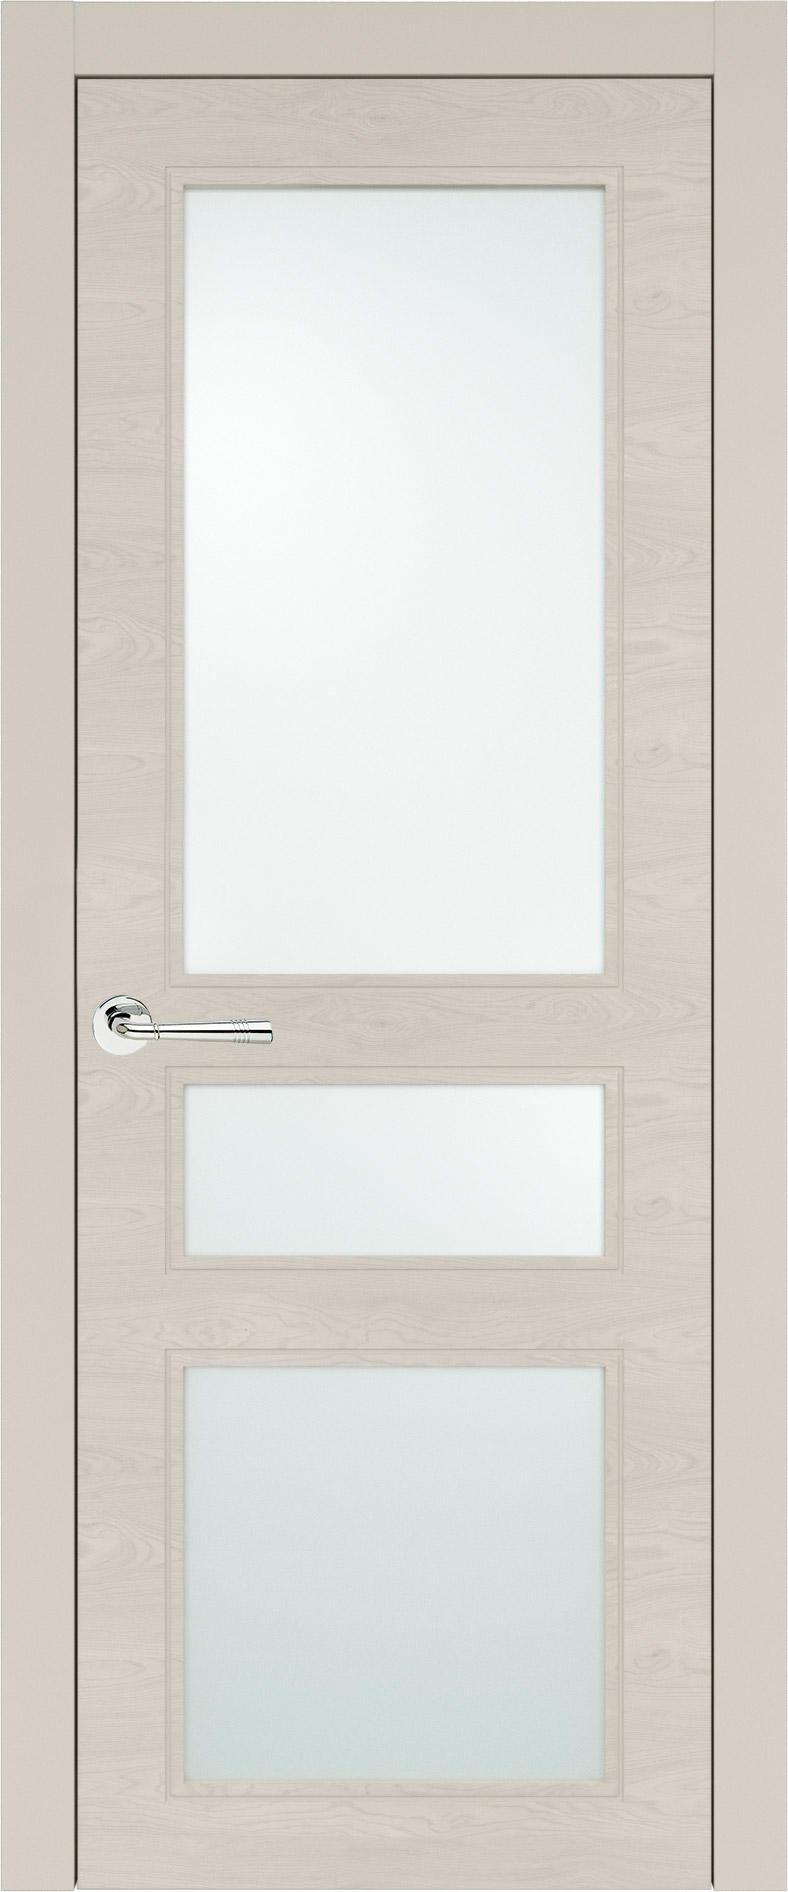 Imperia-R Neo Classic цвет - Жемчужная эмаль по шпону (RAL 1013) Со стеклом (ДО)